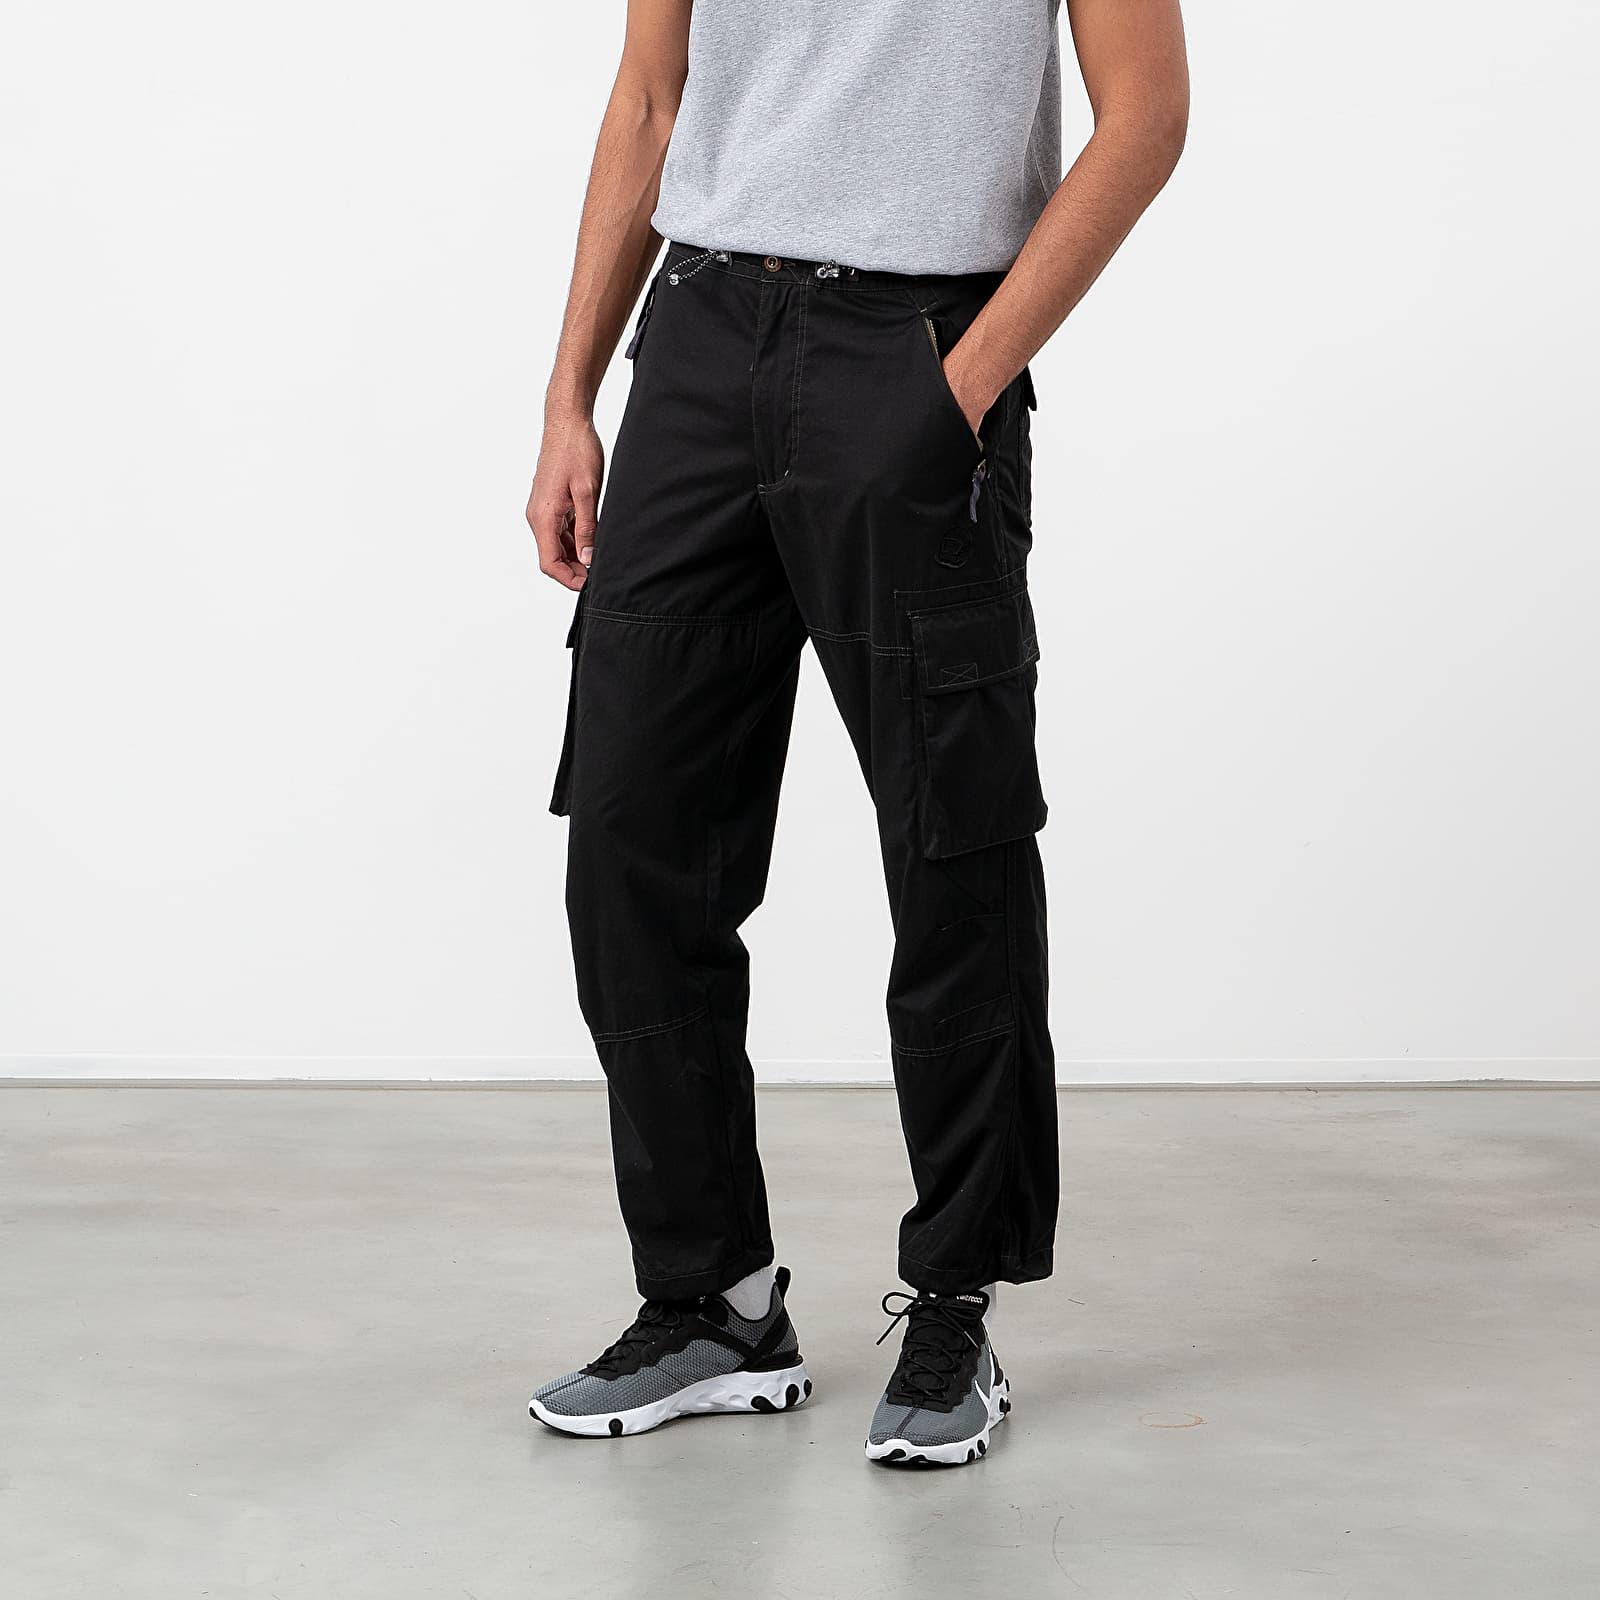 Billionaire Boys Club Multi Pocket Cargo Pants